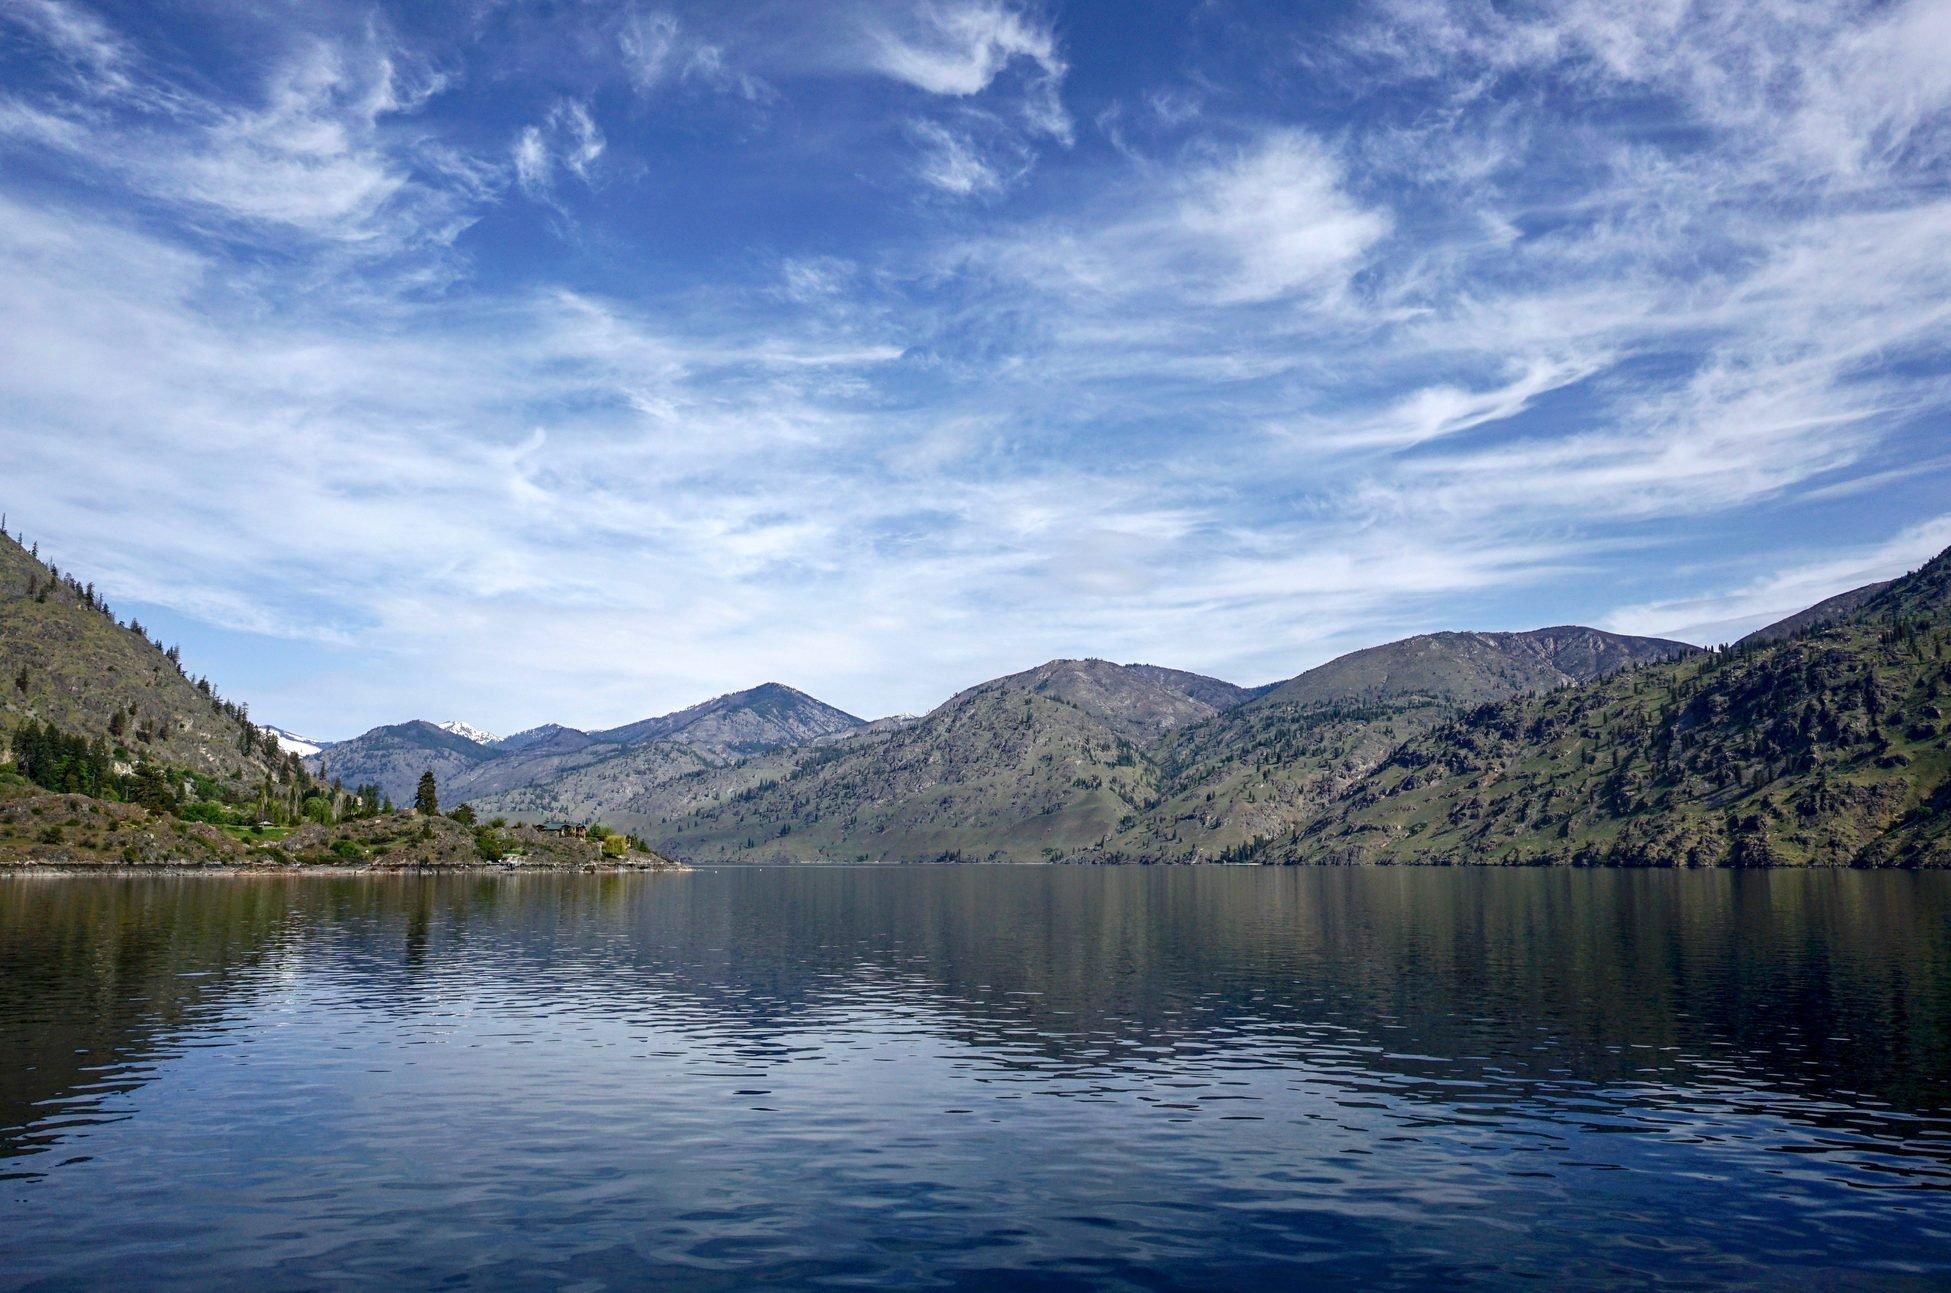 Blue Sky, Blue Lake, Mountains, Lake Chelan, Washington